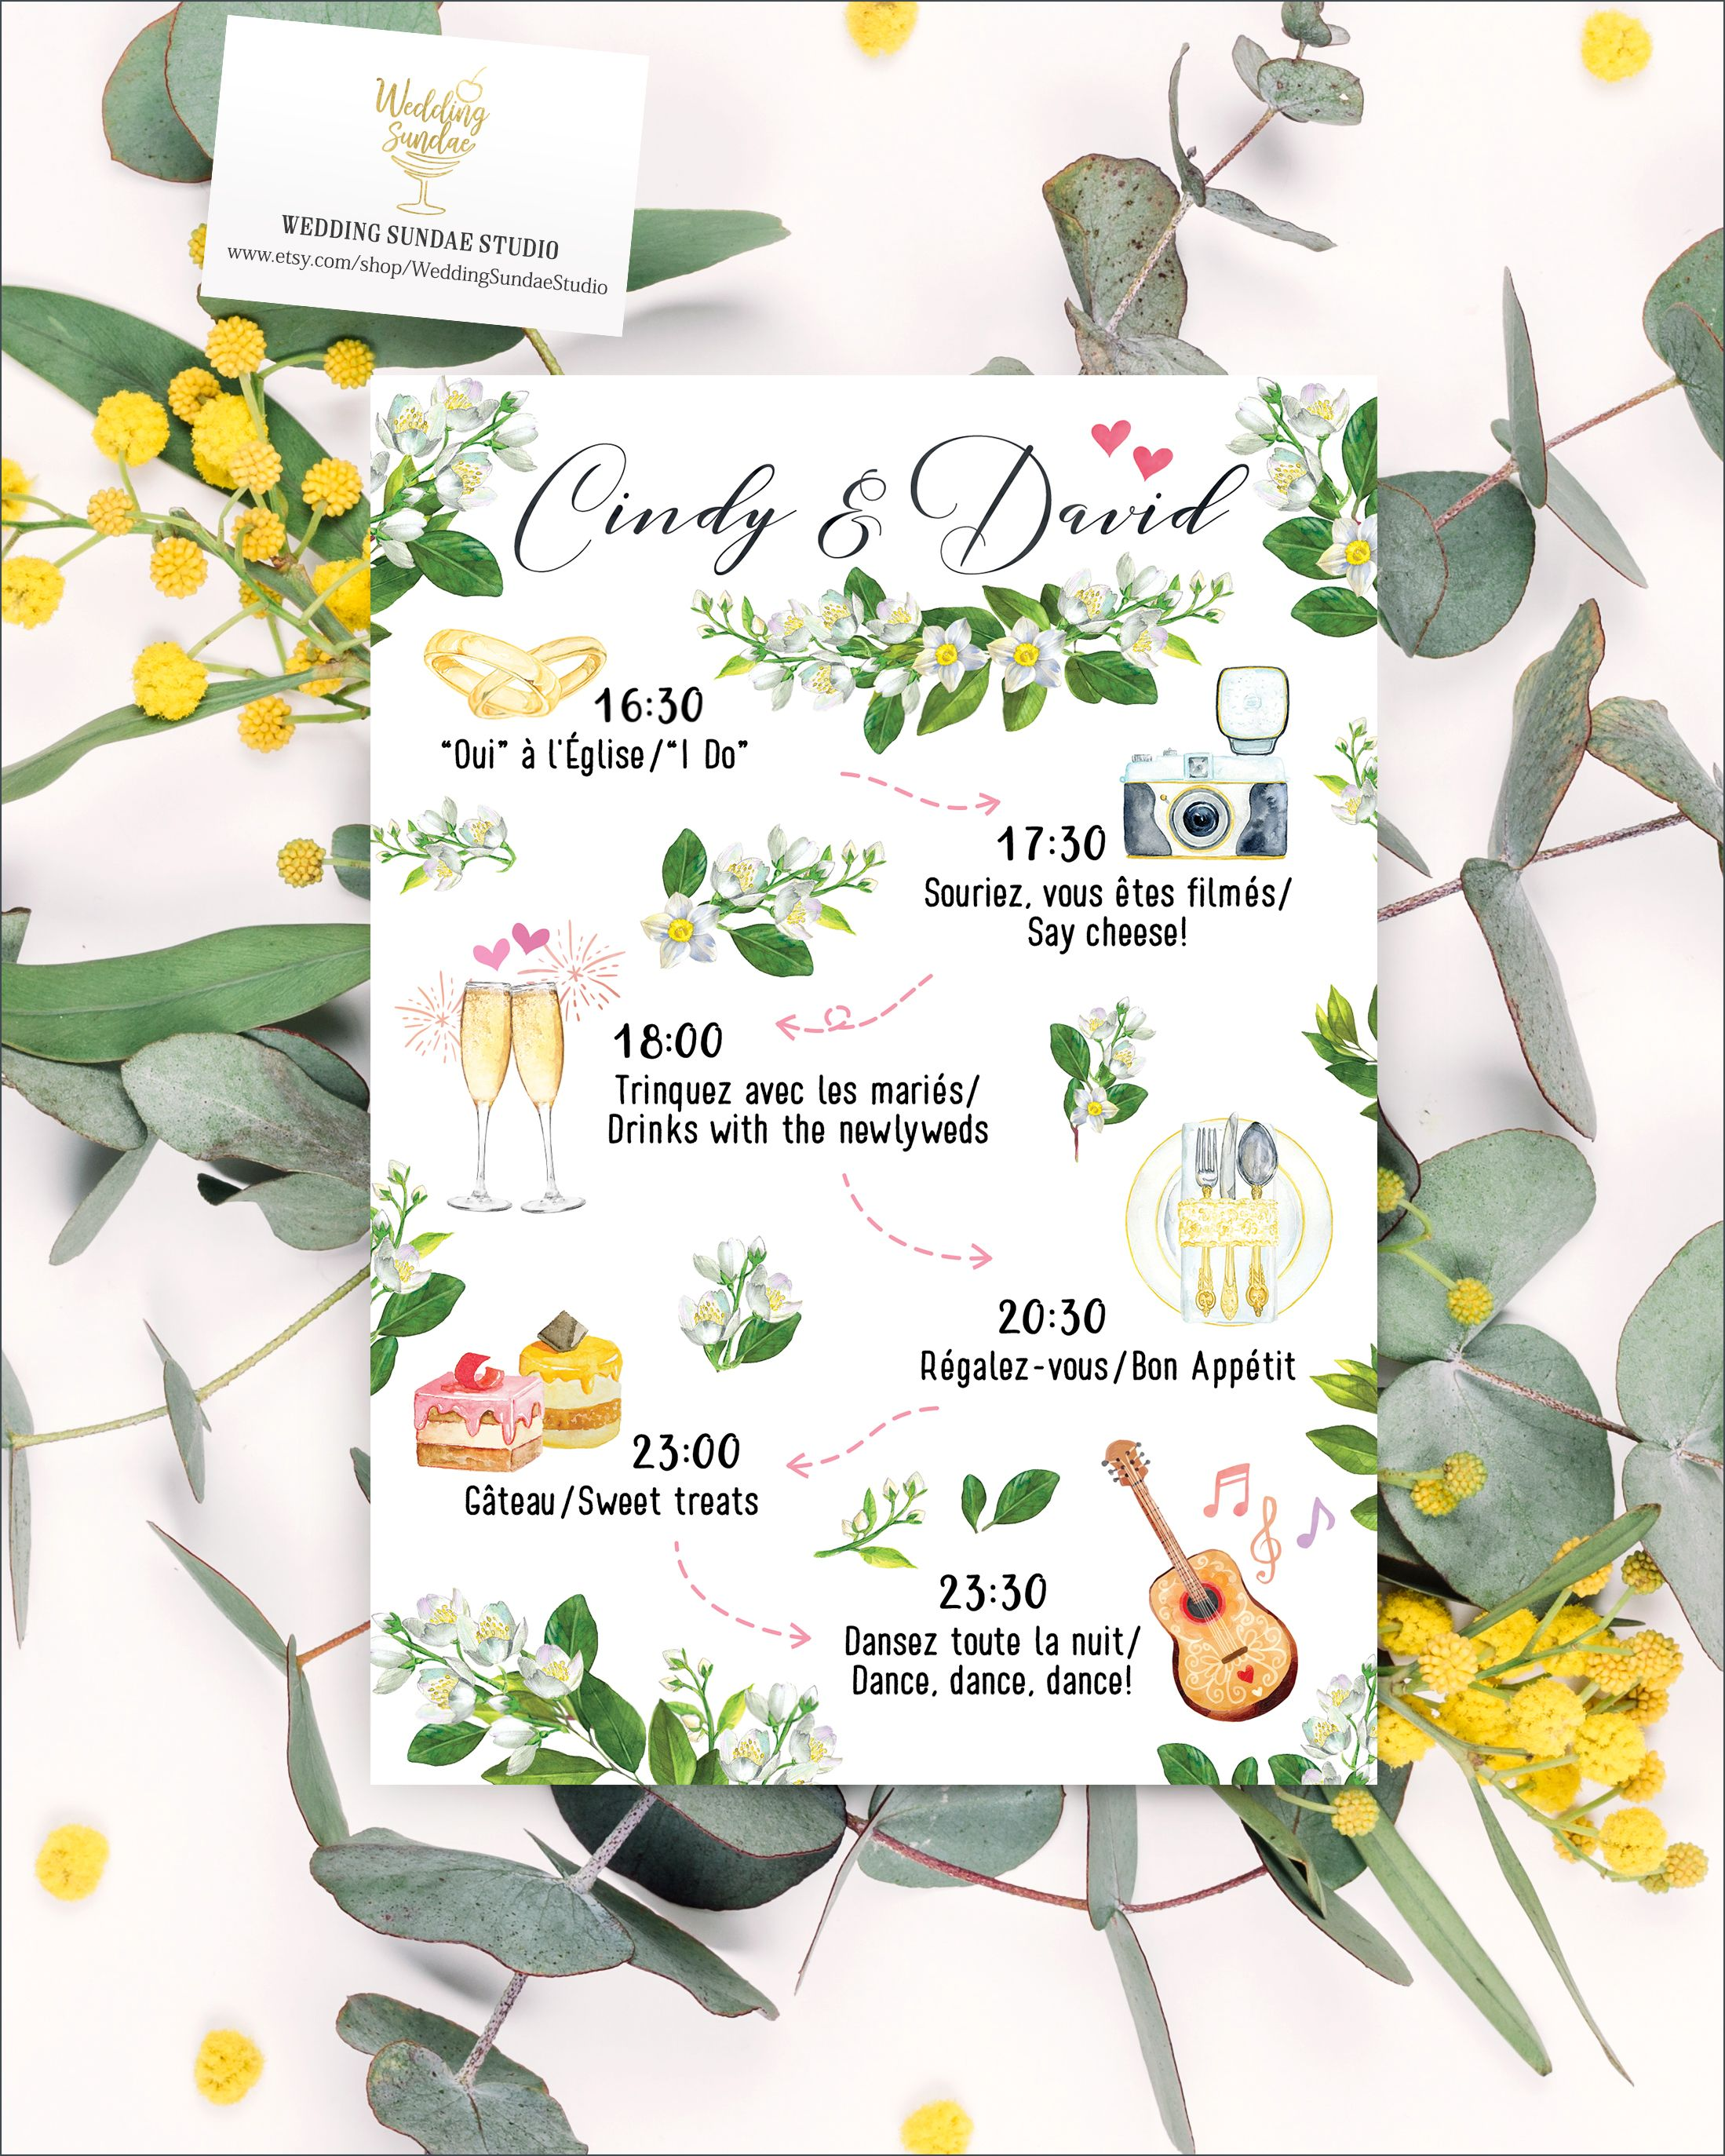 Digital Printable Files Destination Wedding CORK IRELAND Watercolor Painting Wedding Invitation RSVP Card Set Wedding Stationery ID788